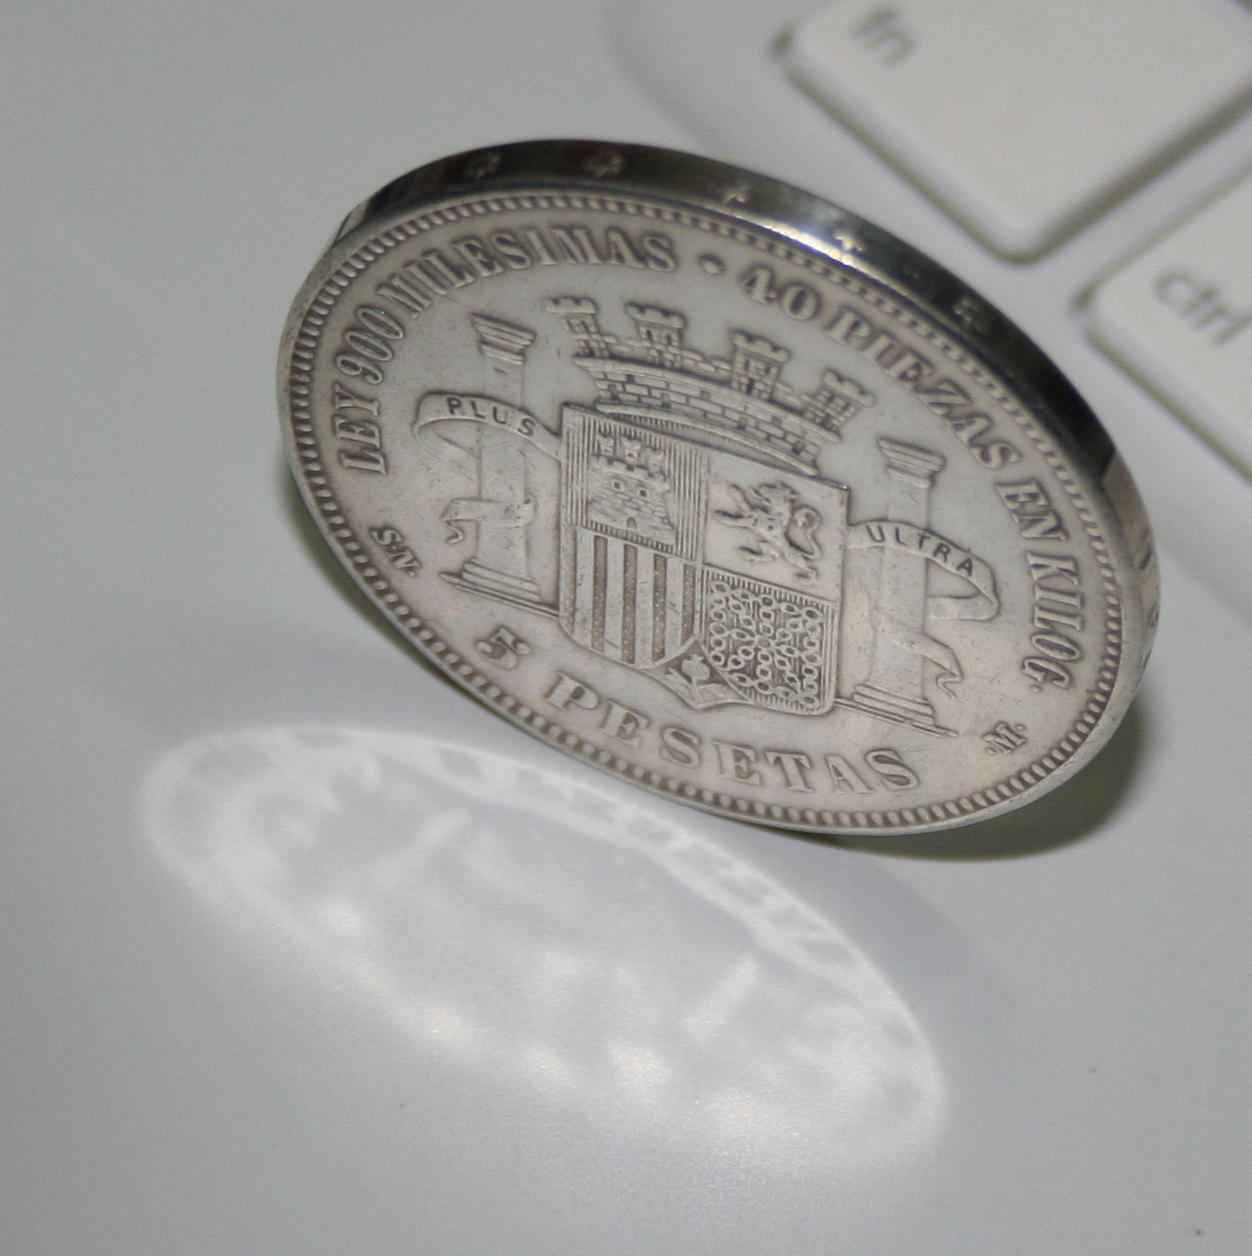 5 pesetas 1870 Falsa de epoca? o ni eso! 16jkc41